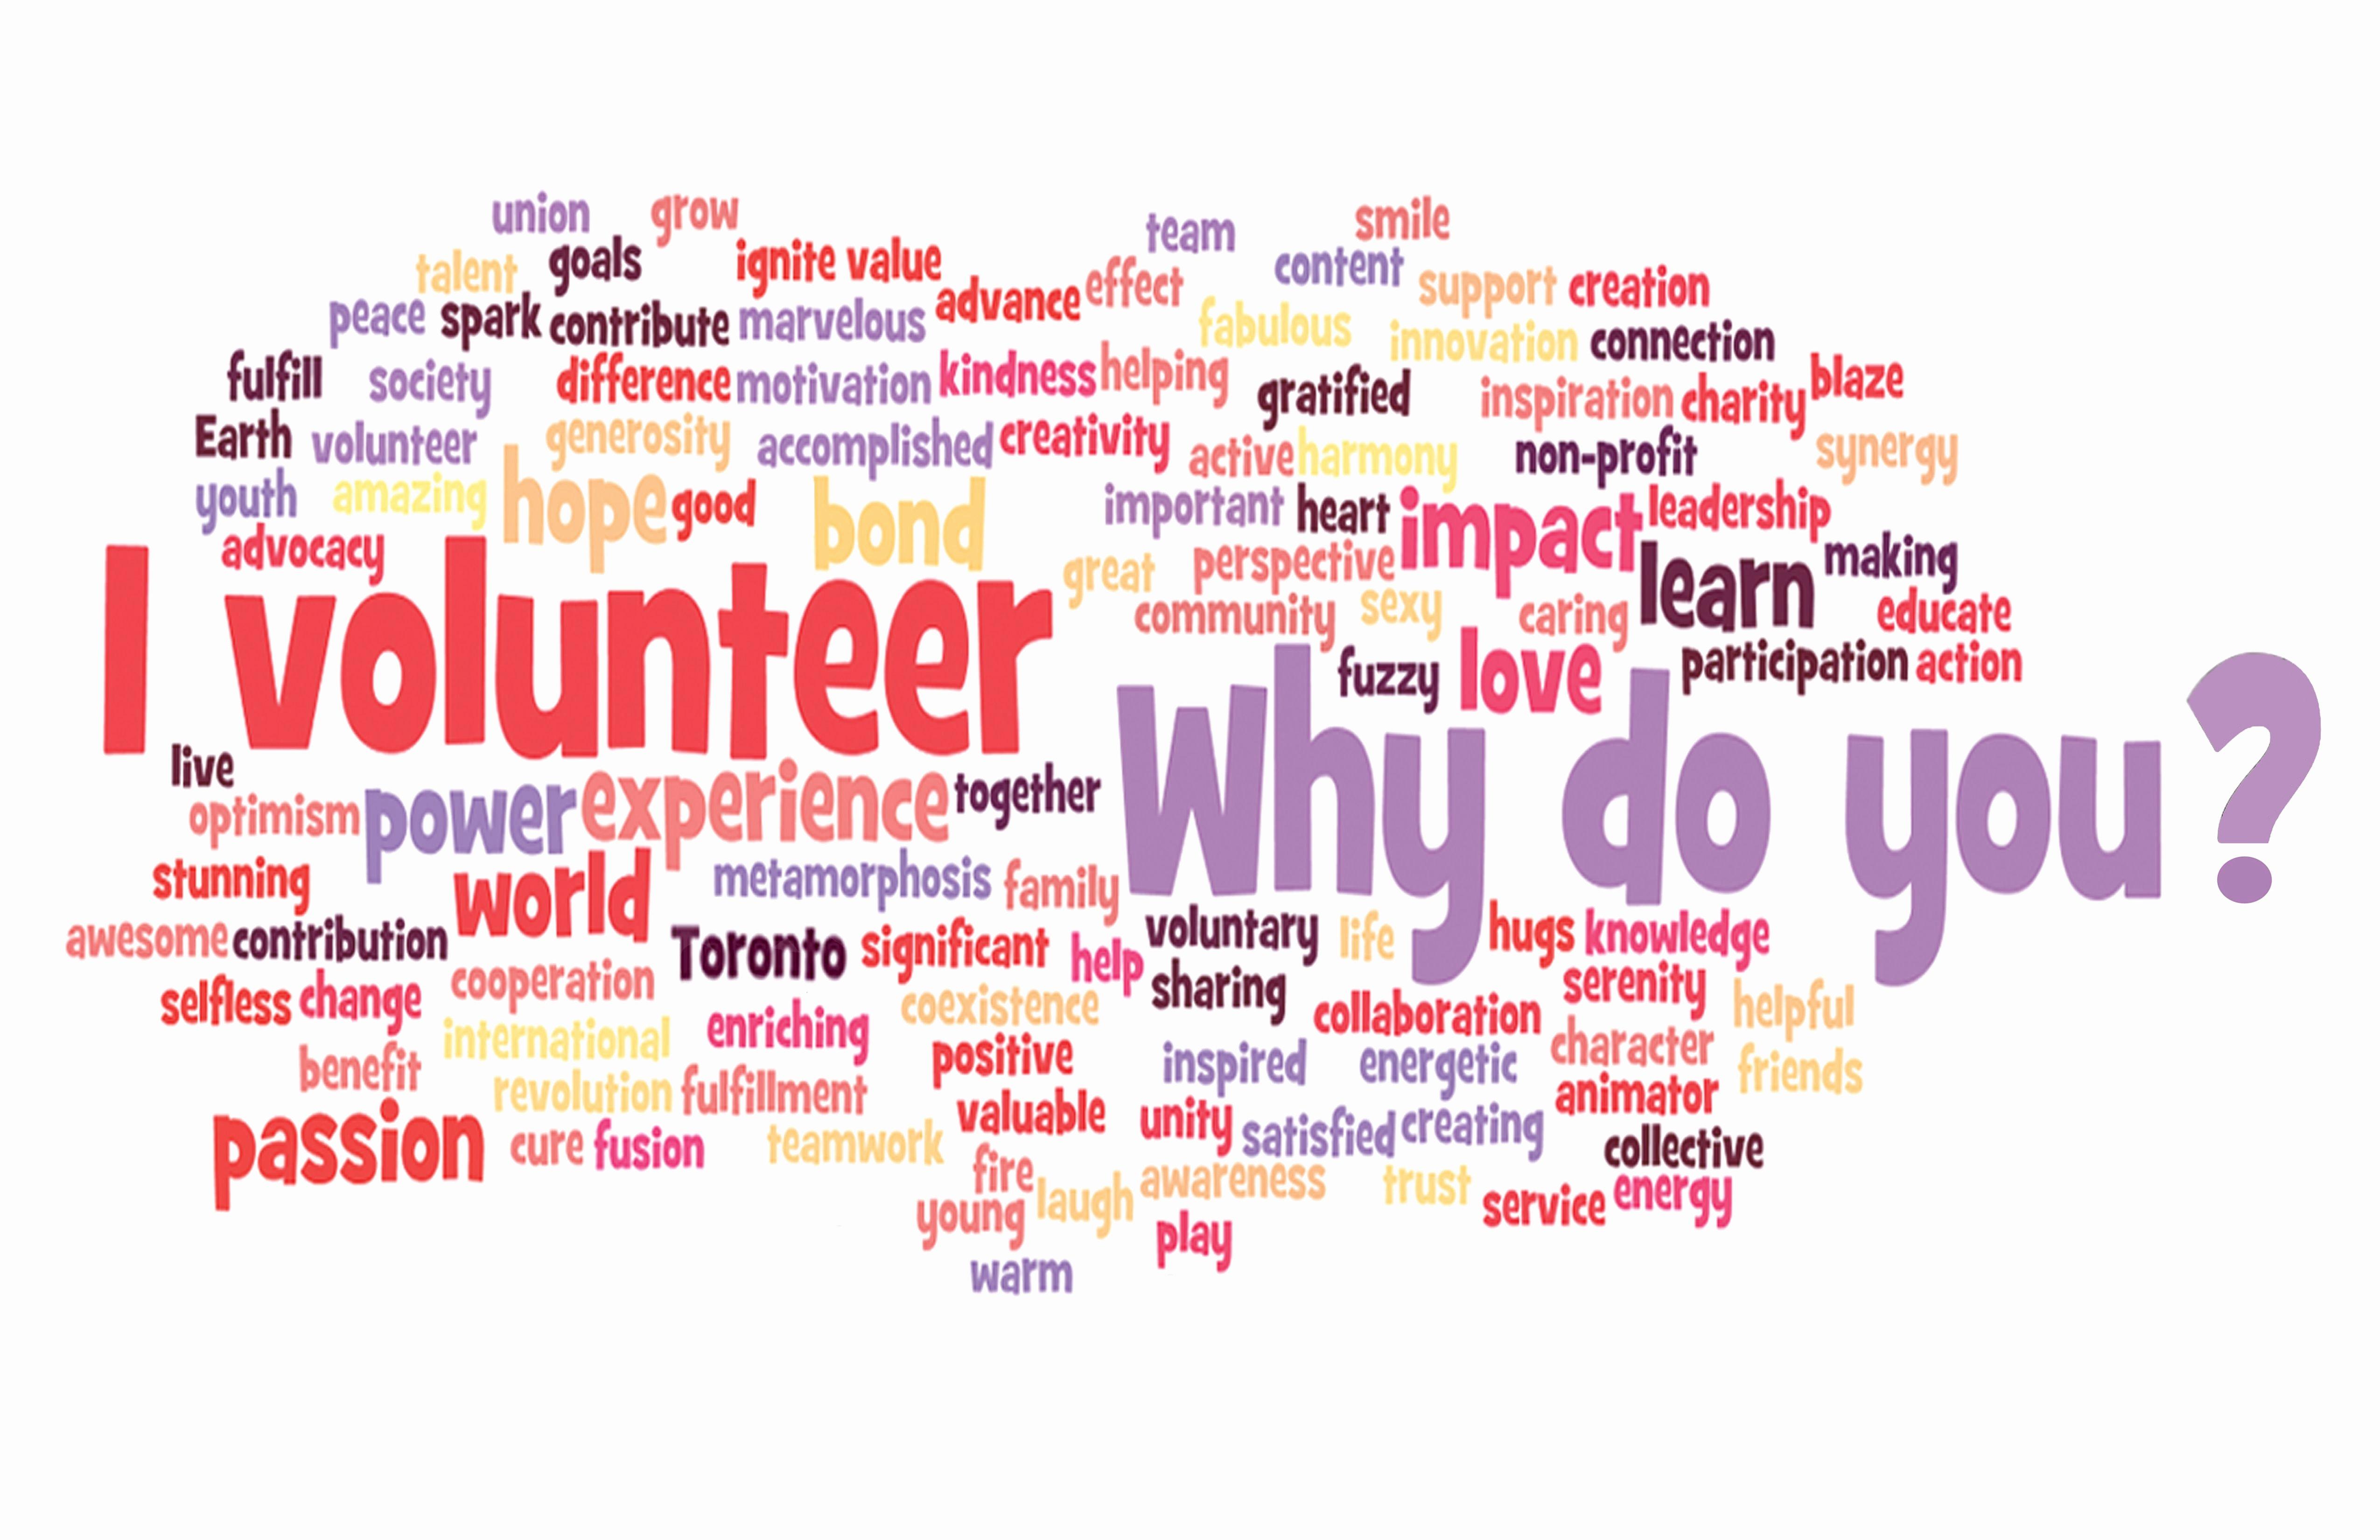 Volunteer Flyer Template Free Luxury Volunteer Flyer Templates Google Search